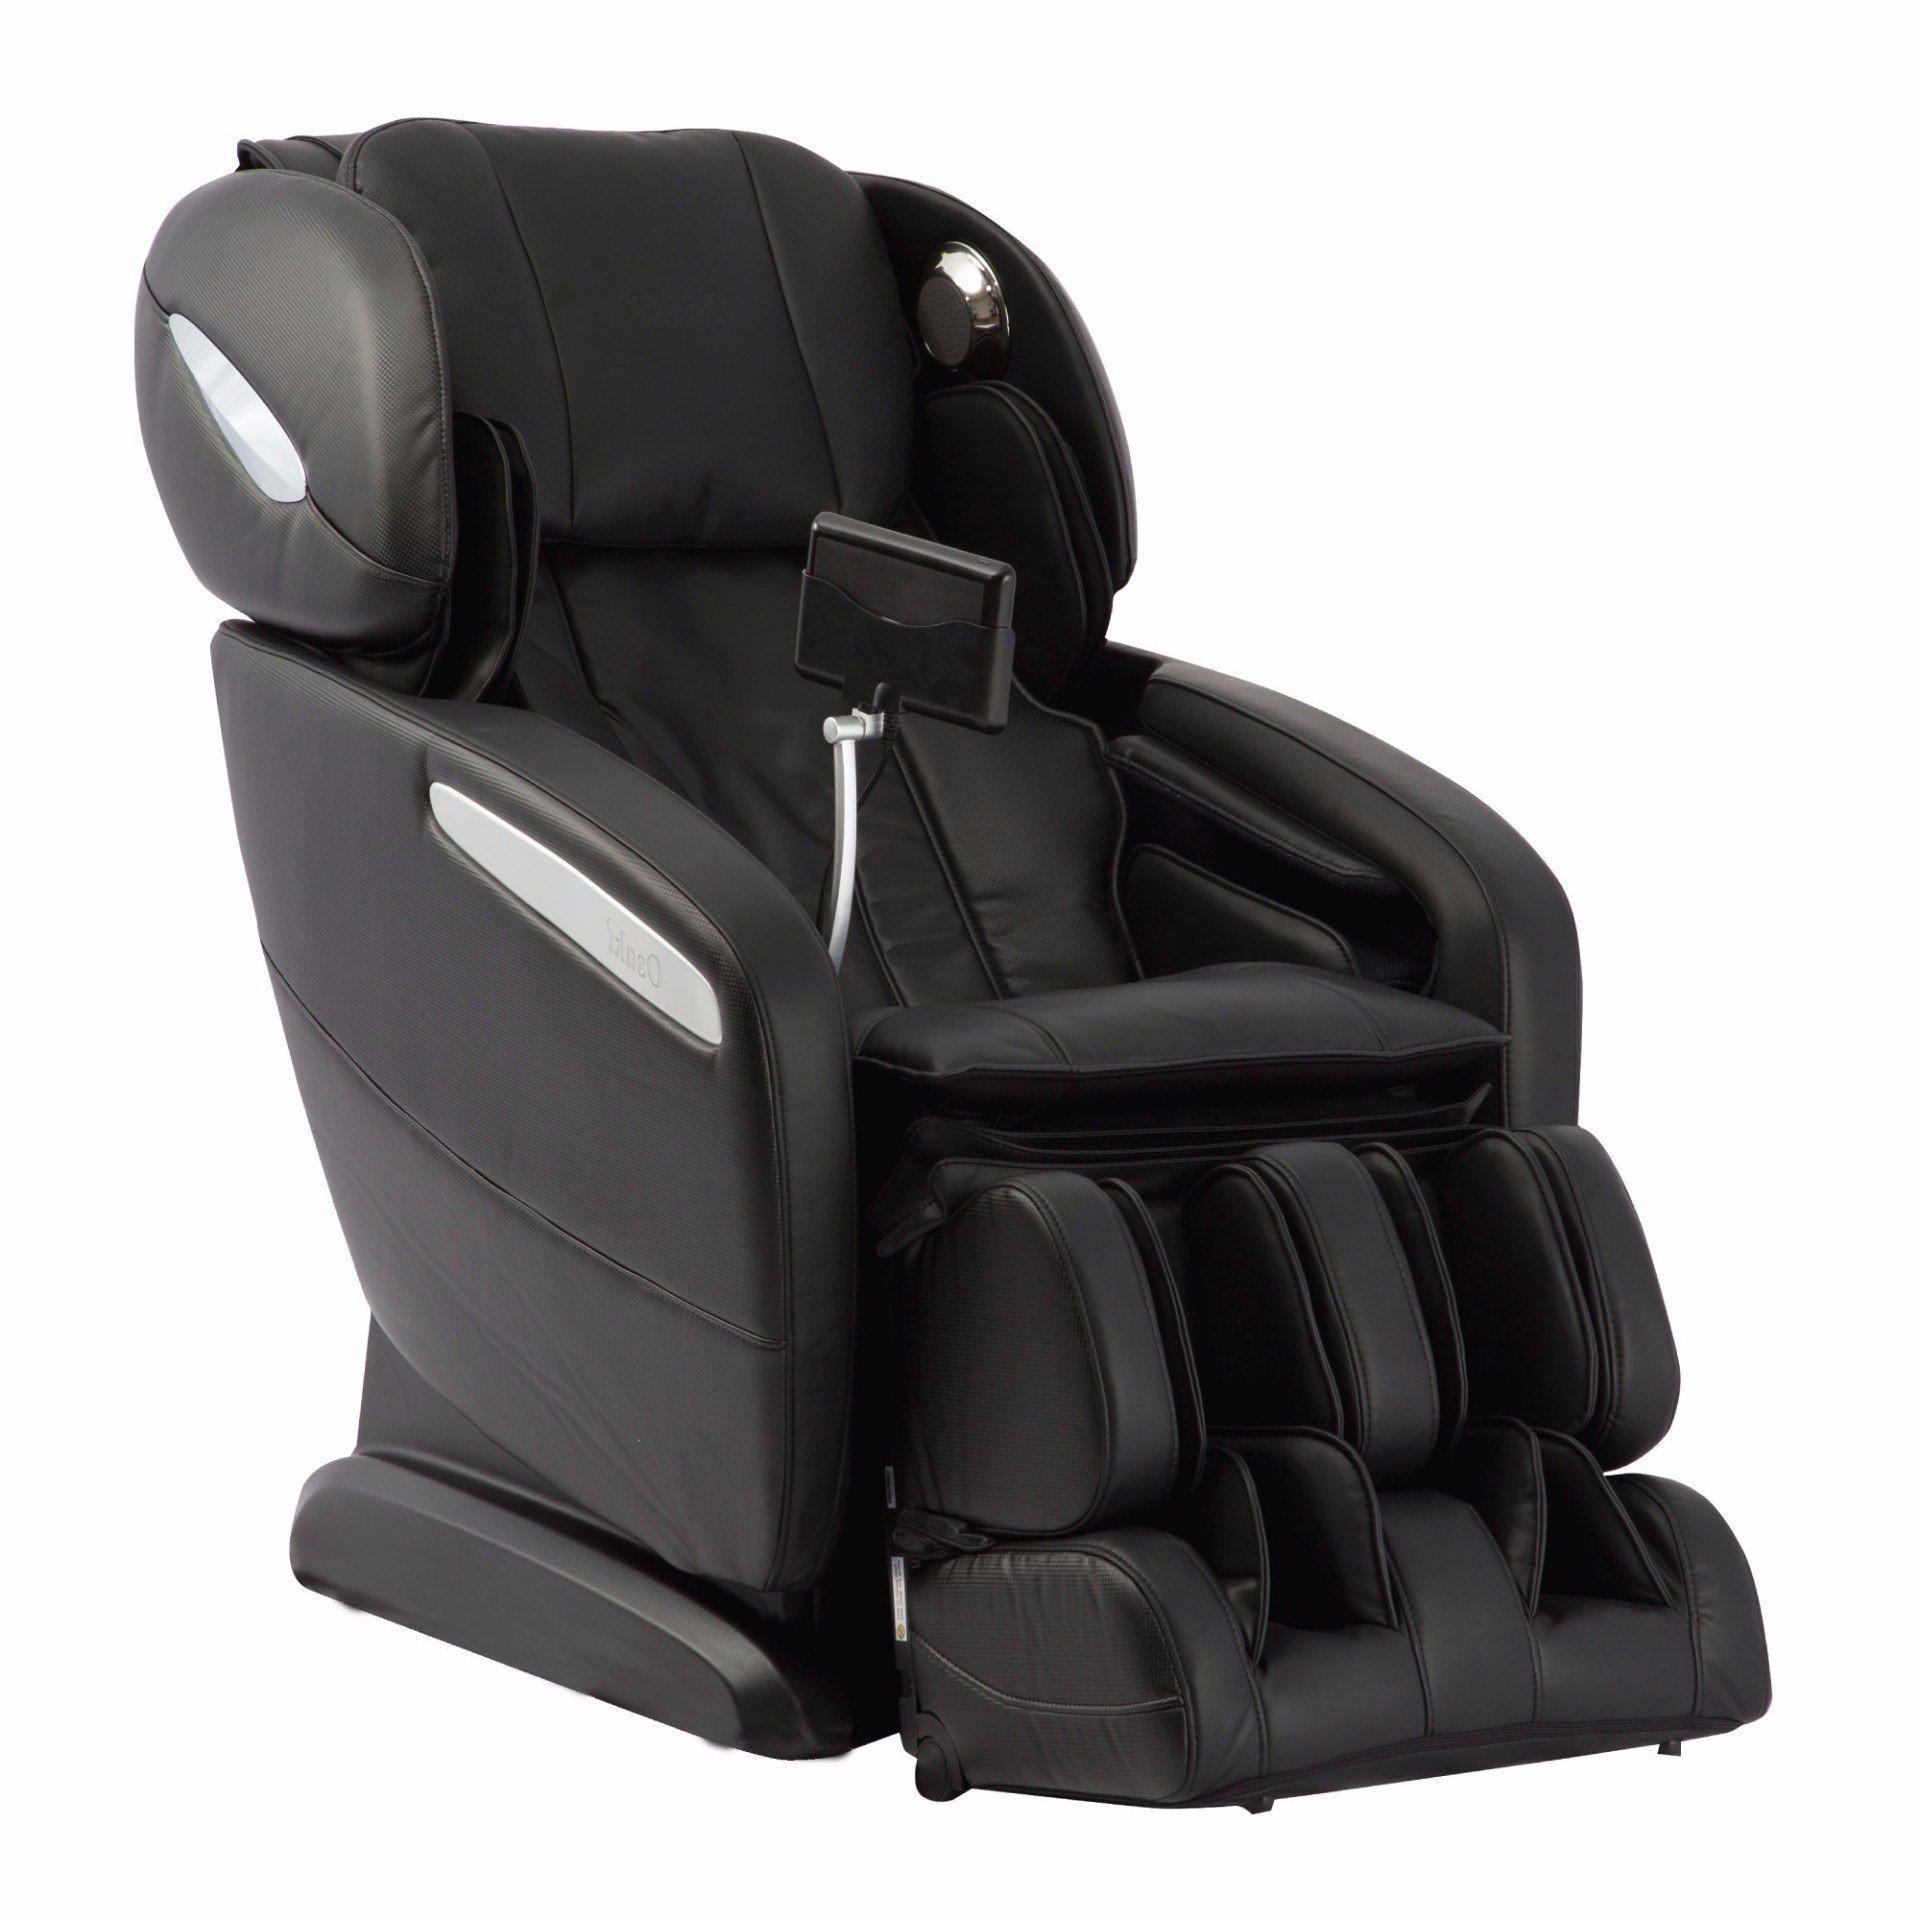 Osaki Massage Chair - Osaki OS-PRO MAXIM